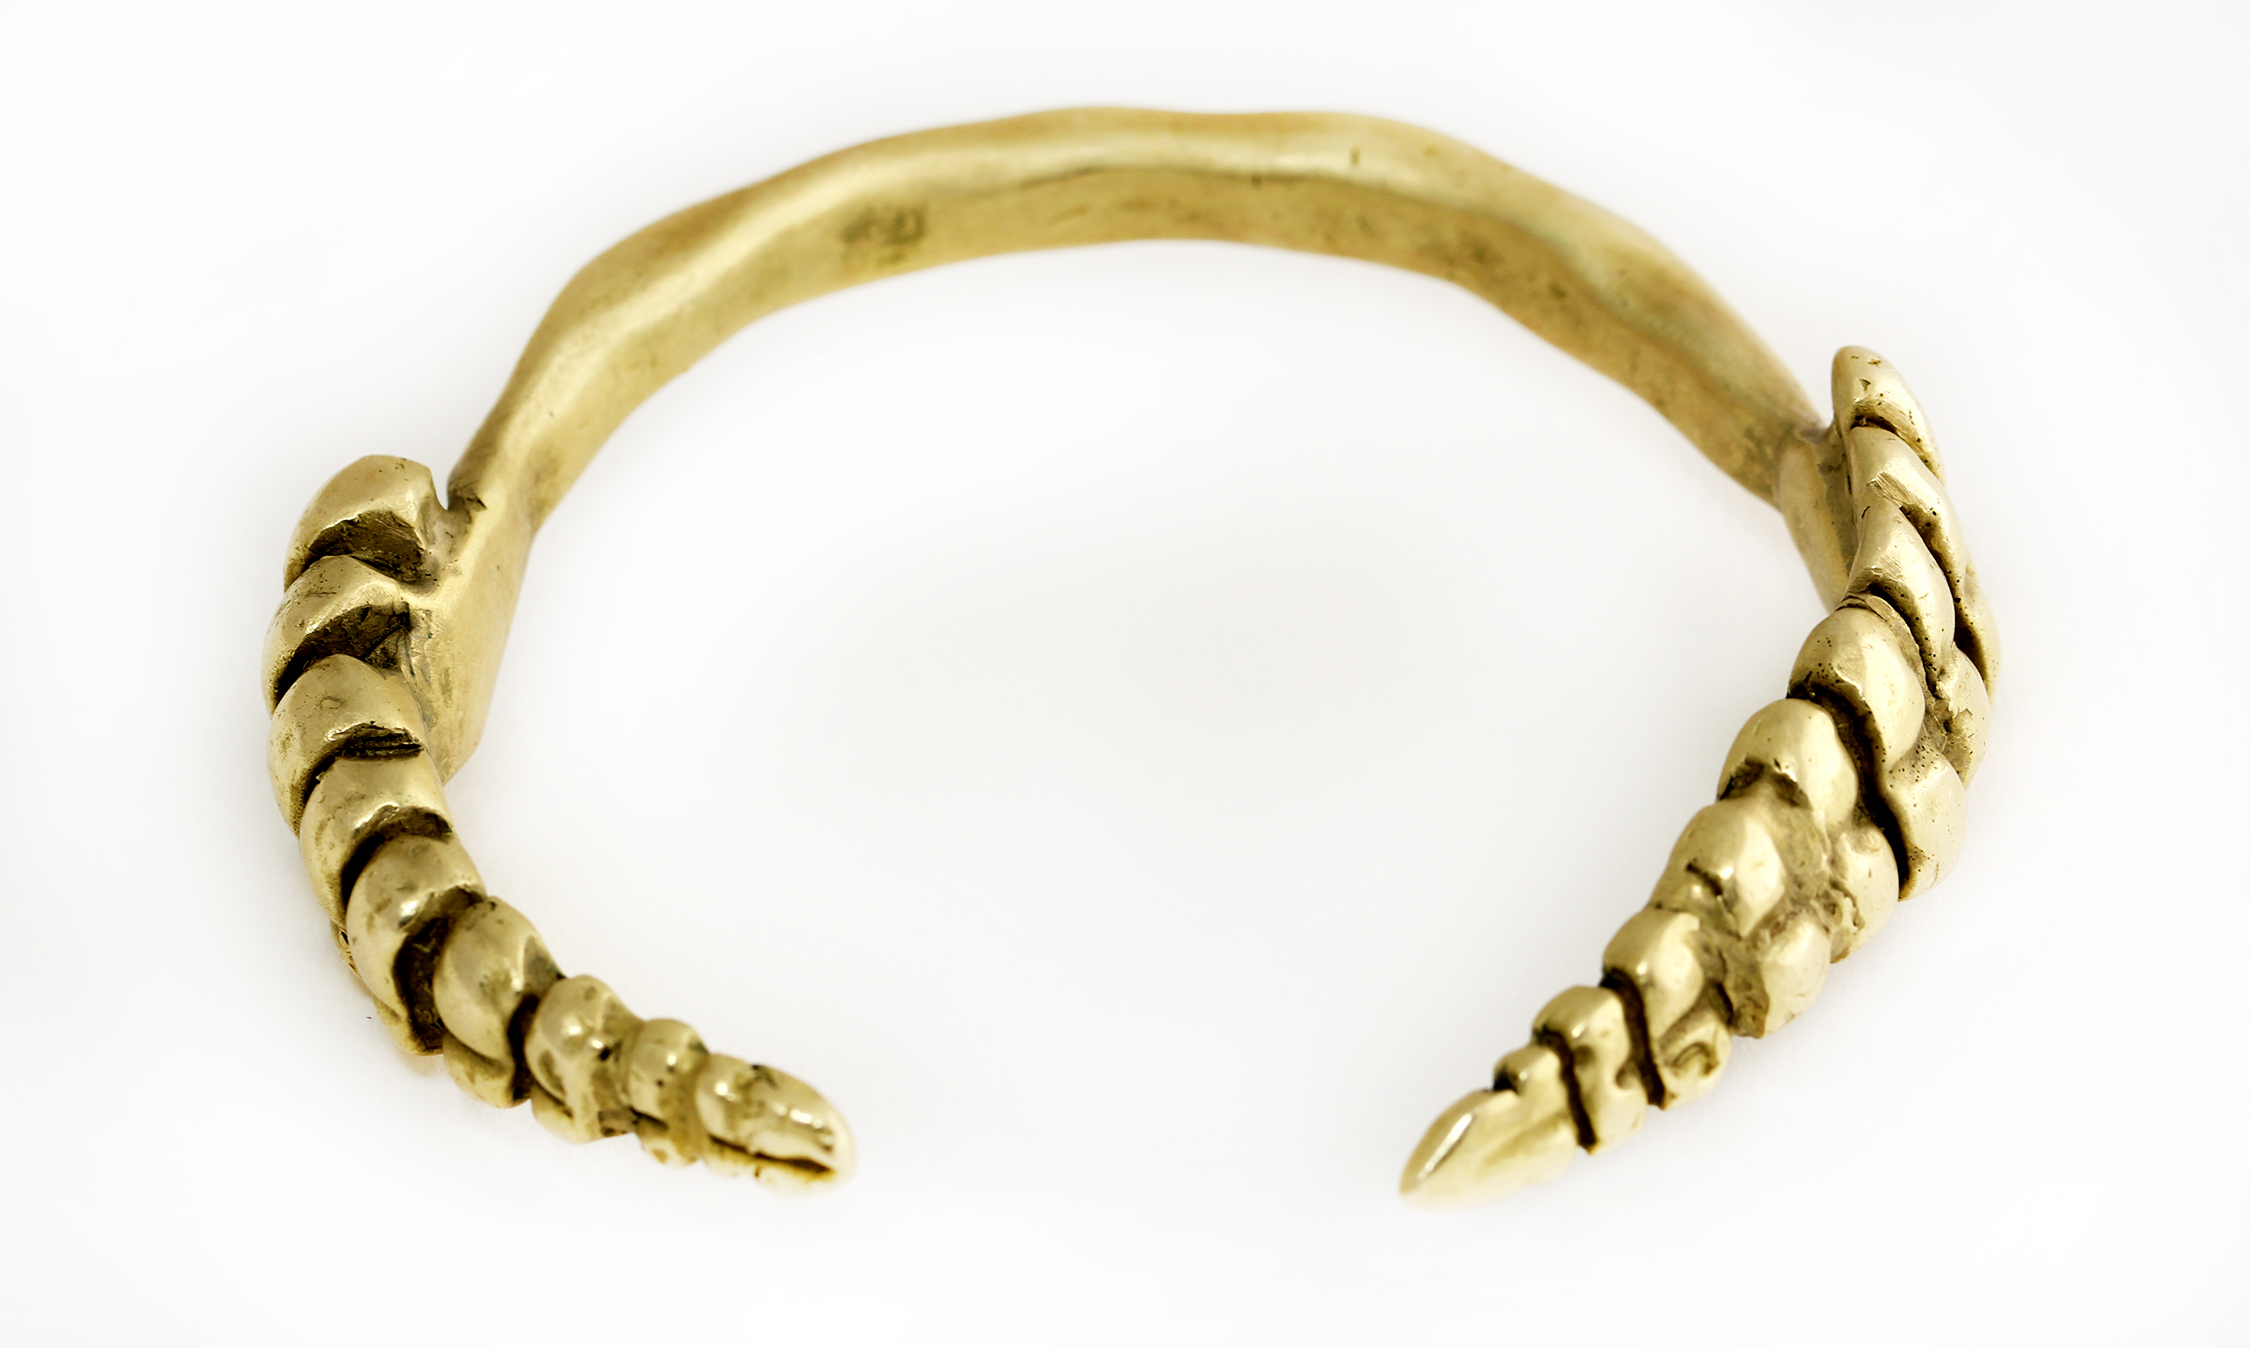 Brass_rattlesnake_cuff.jpg